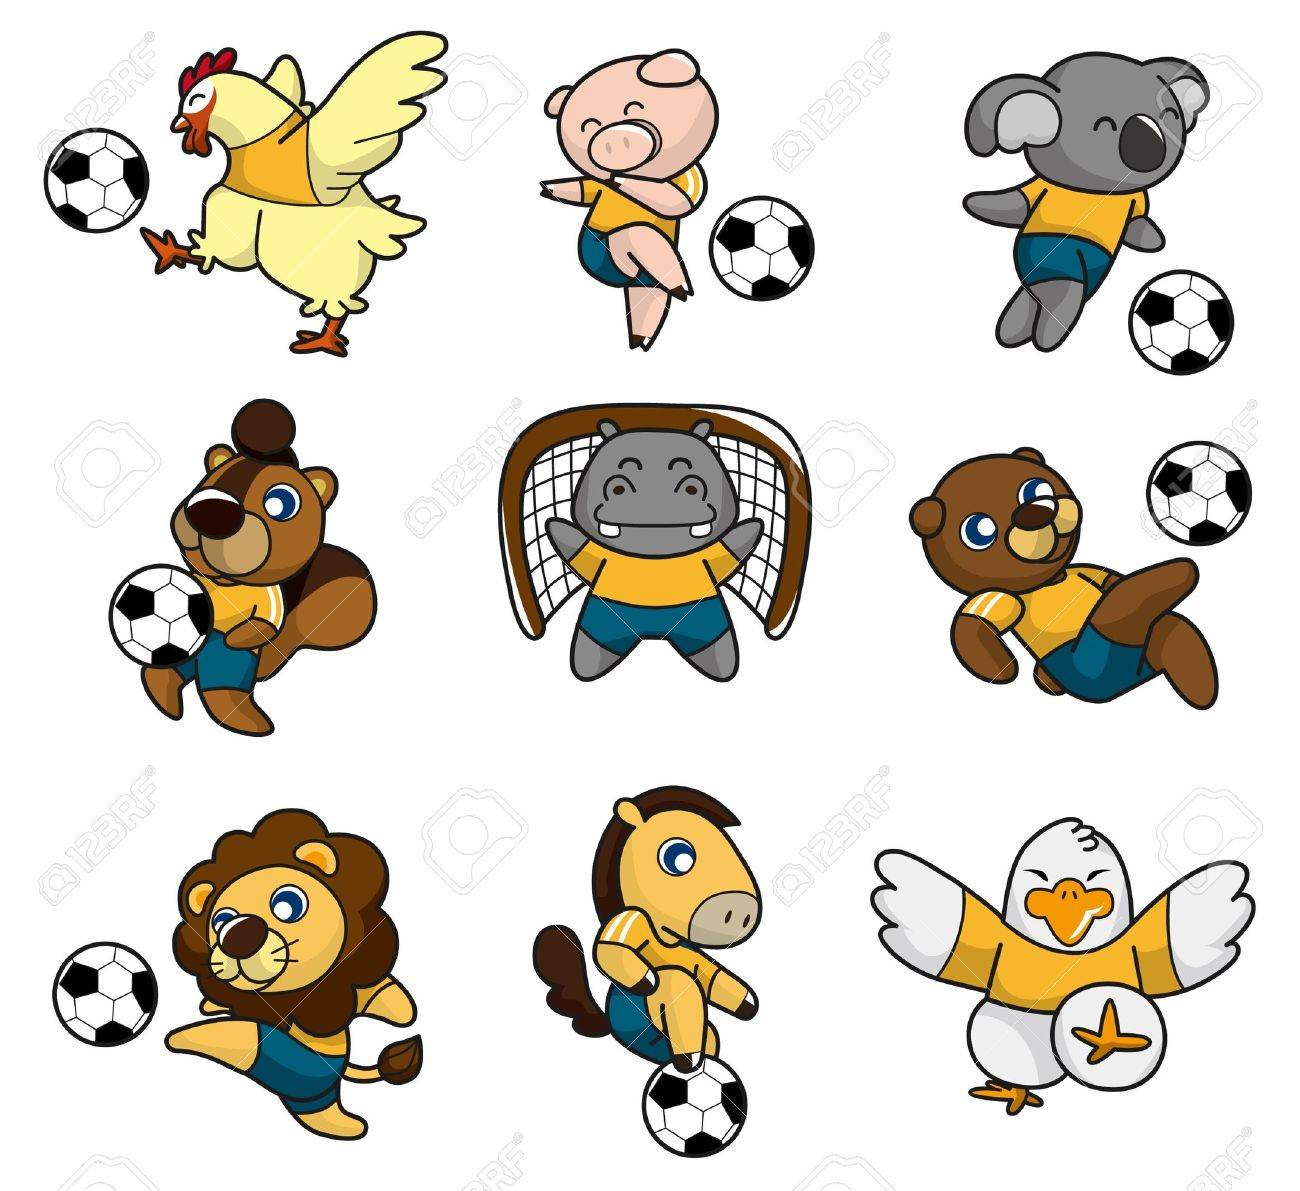 cartoon animal soccer player icon Stock Vector - 8545547